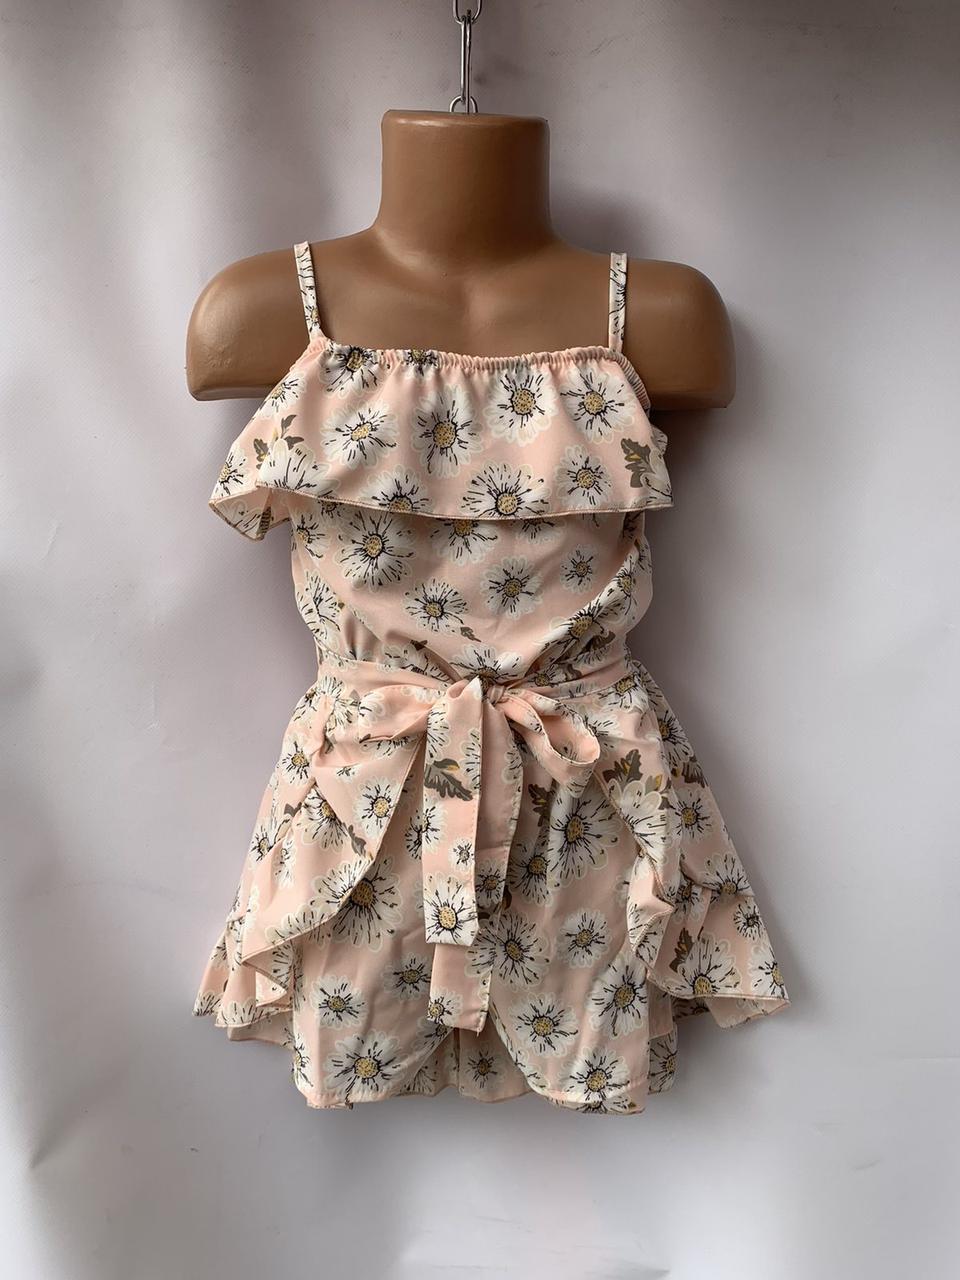 Комплект для девочки комбез и юбка цветок р.5-8 лет